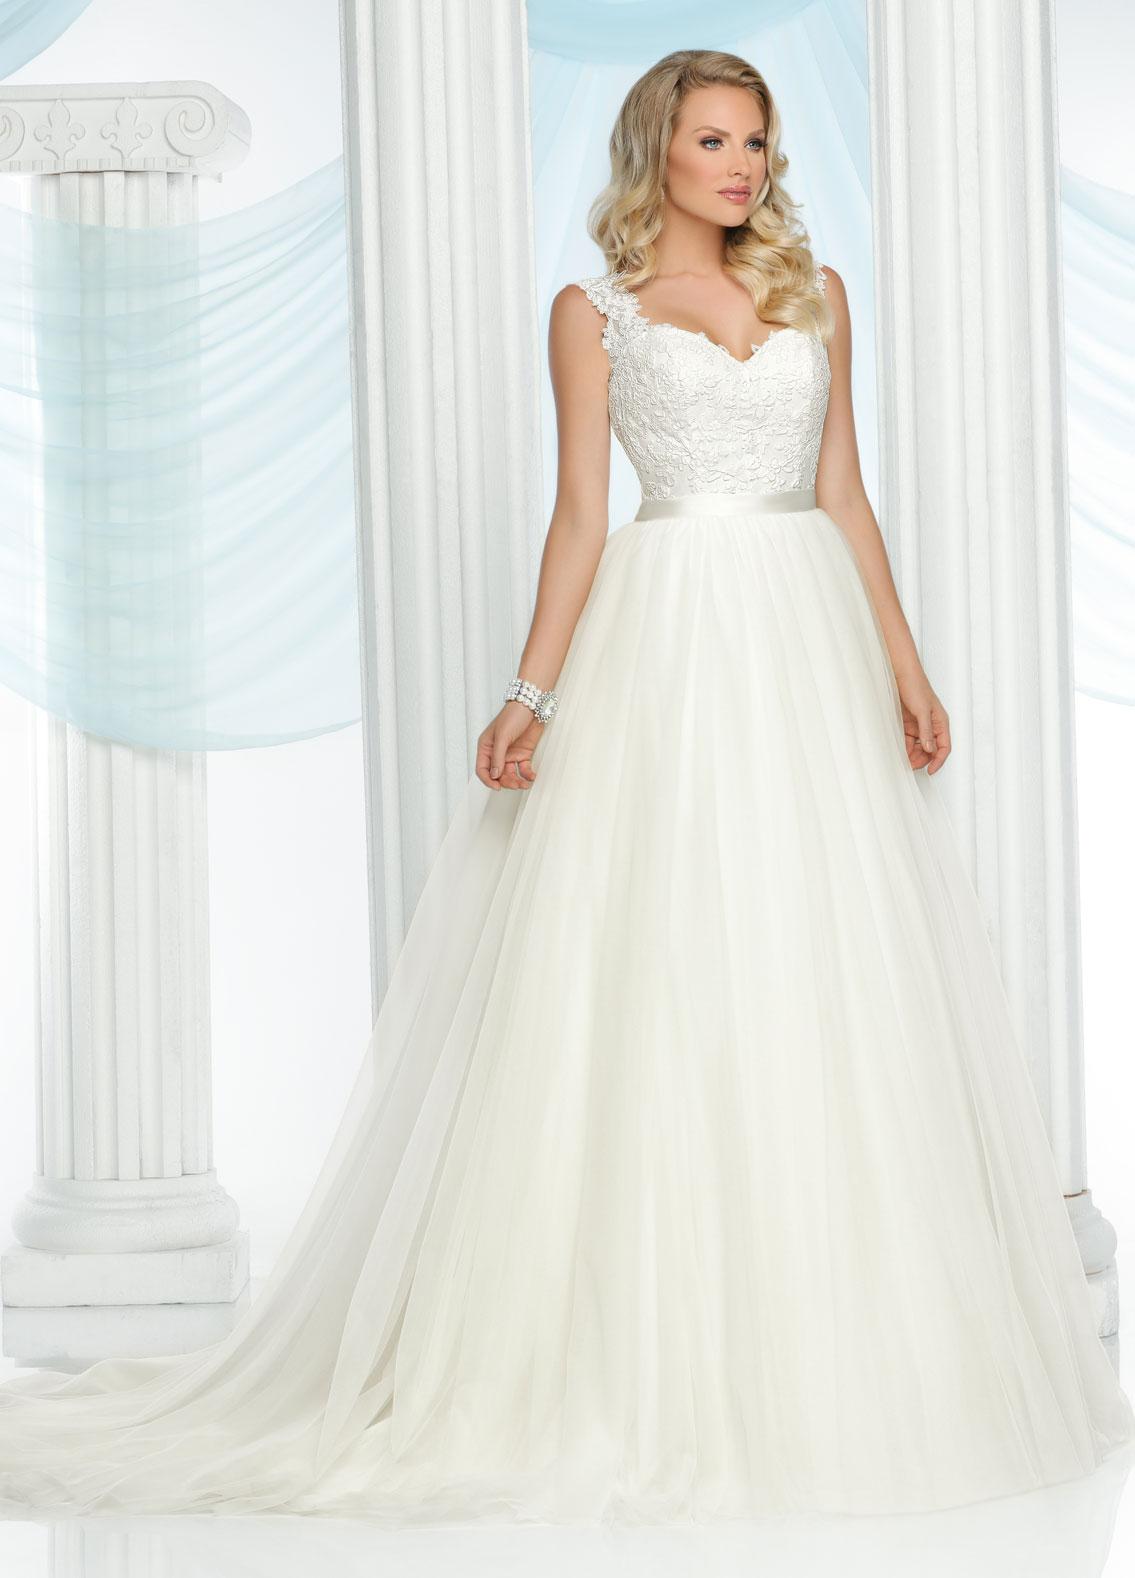 7 Brand New Wedding Gowns